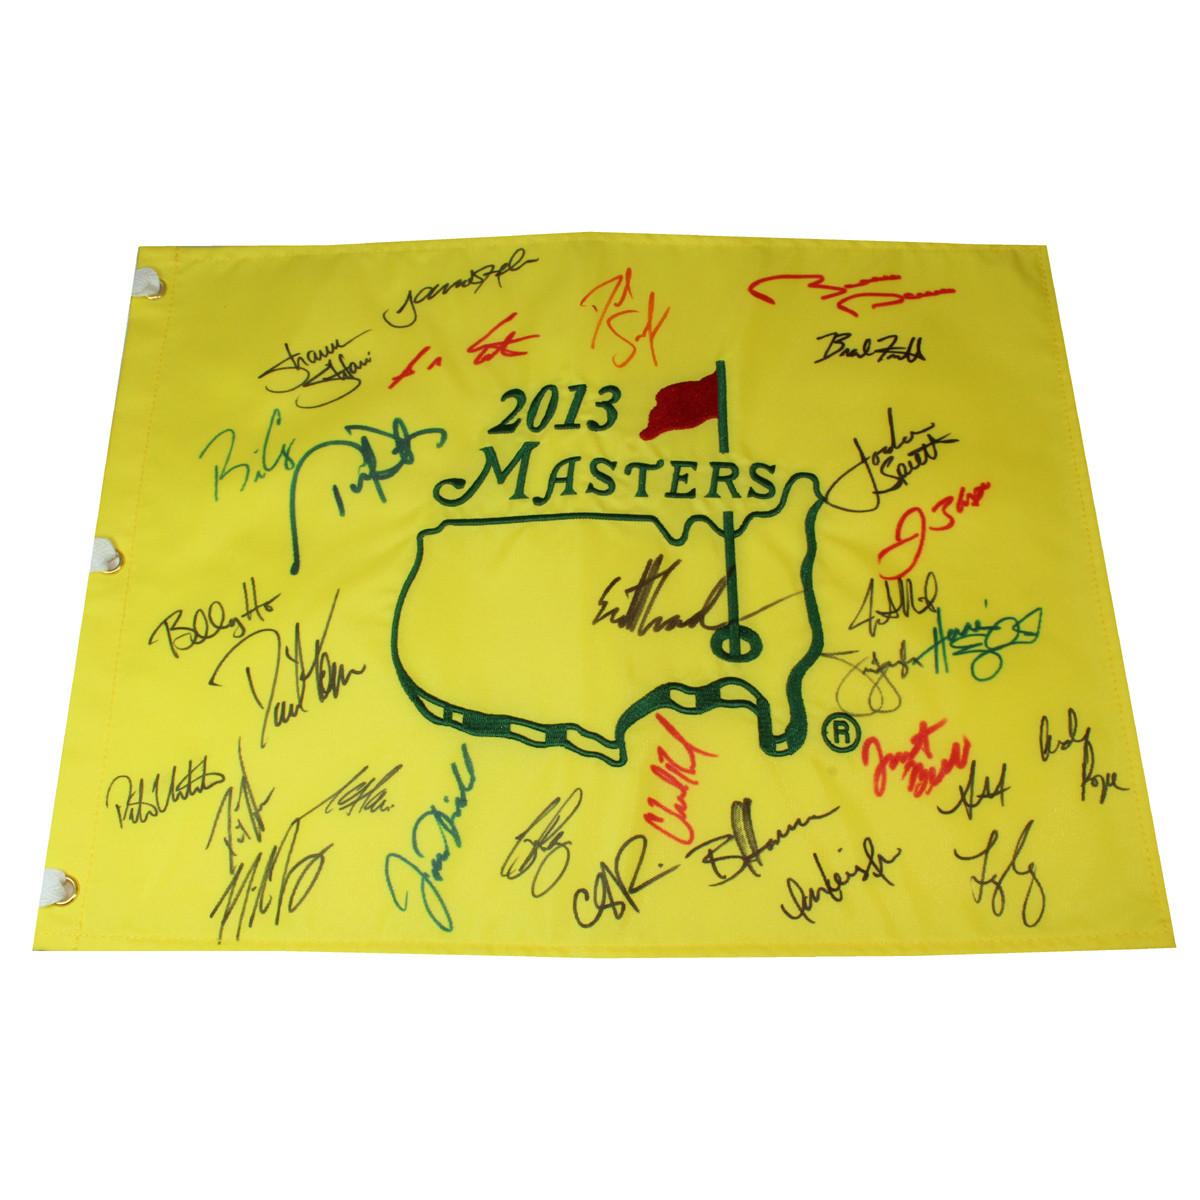 Authentic Autographed Masters Merchandise